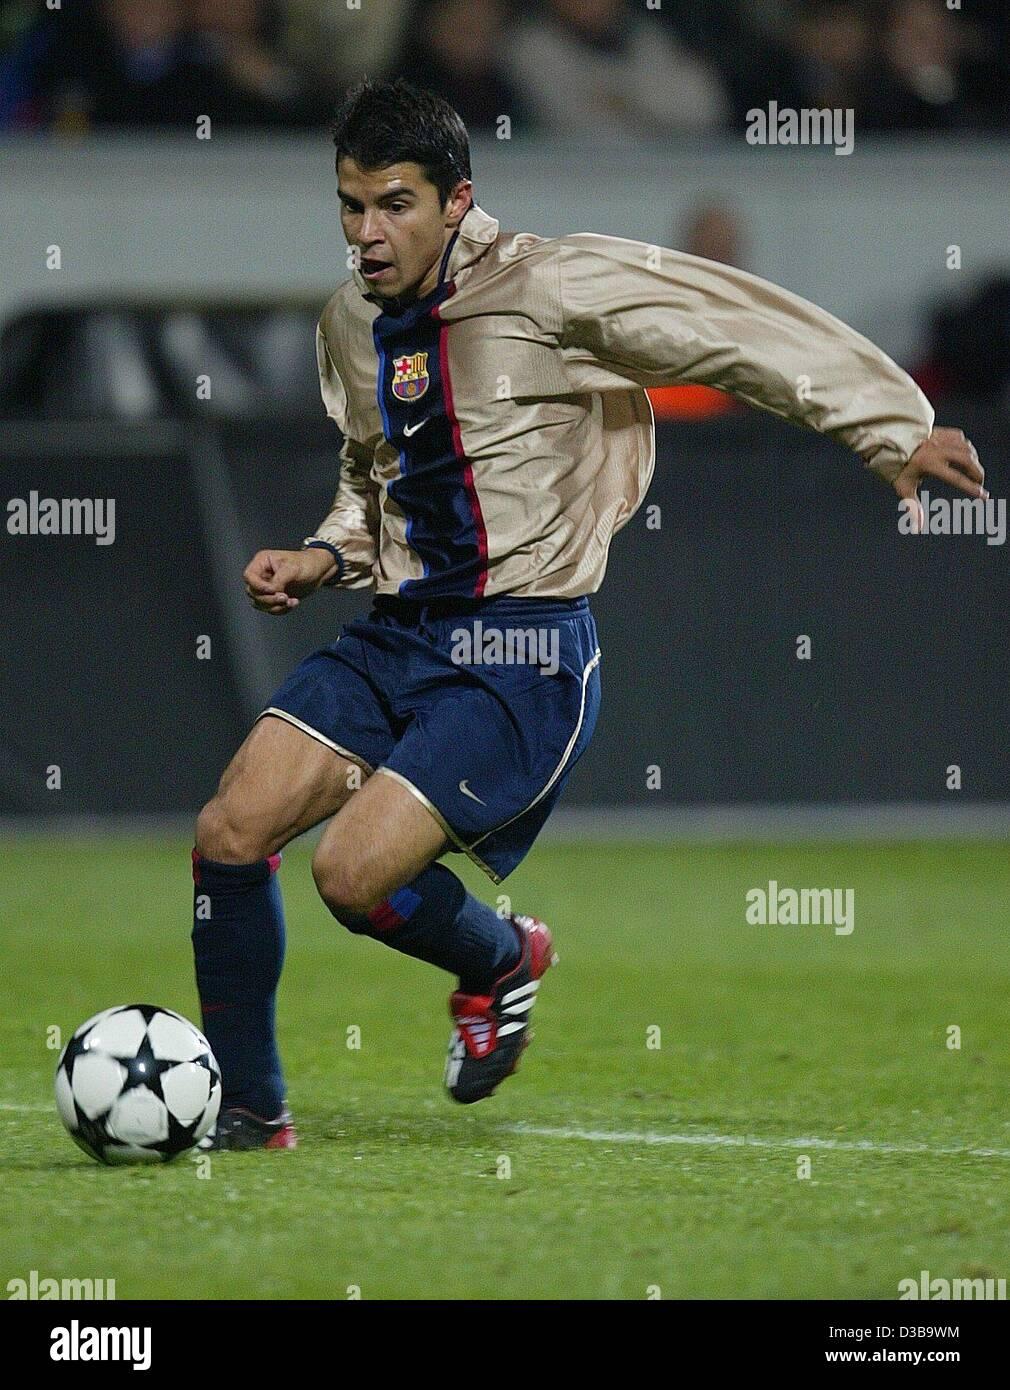 (dpa) - Barcelona's Argentine midfielder Javier Saviola dribbles during the UEFA Champions League match Bayer - Stock Image